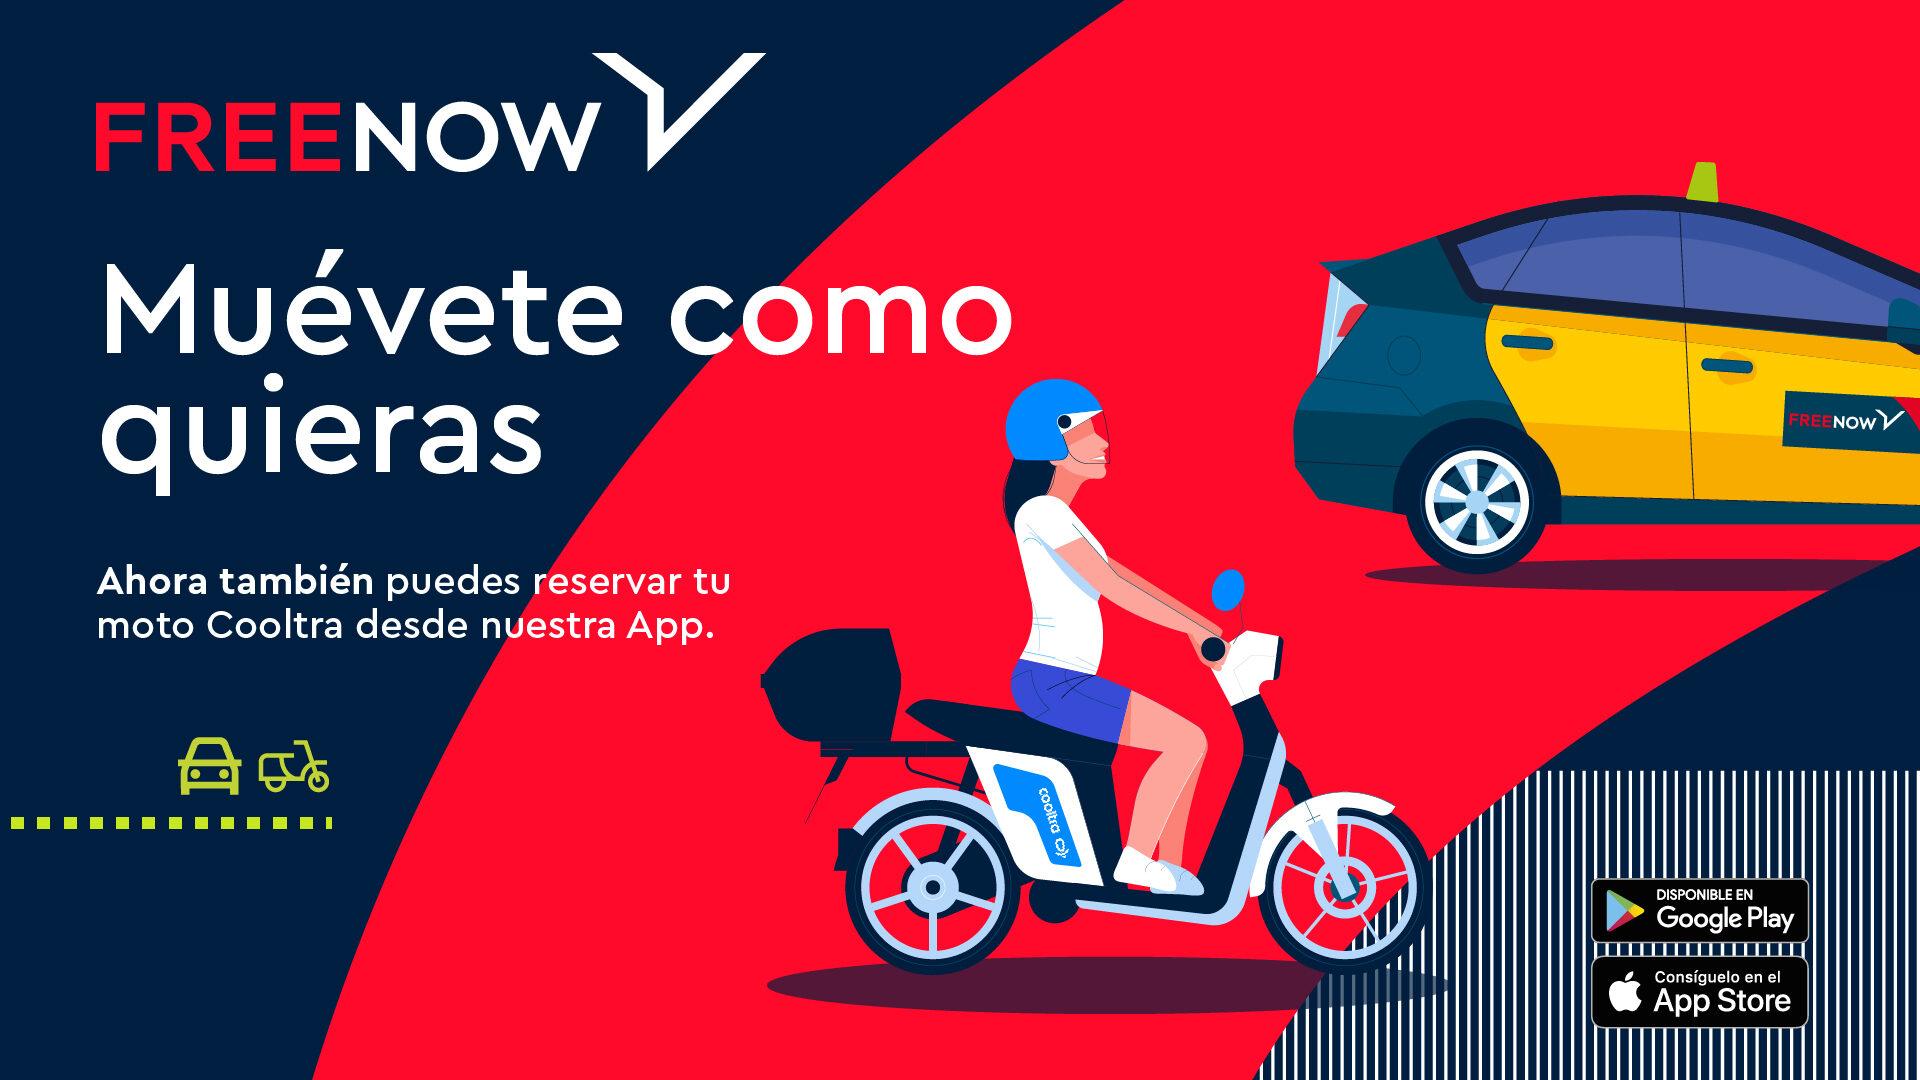 Alquila una moto de Cooltra desde Free Now